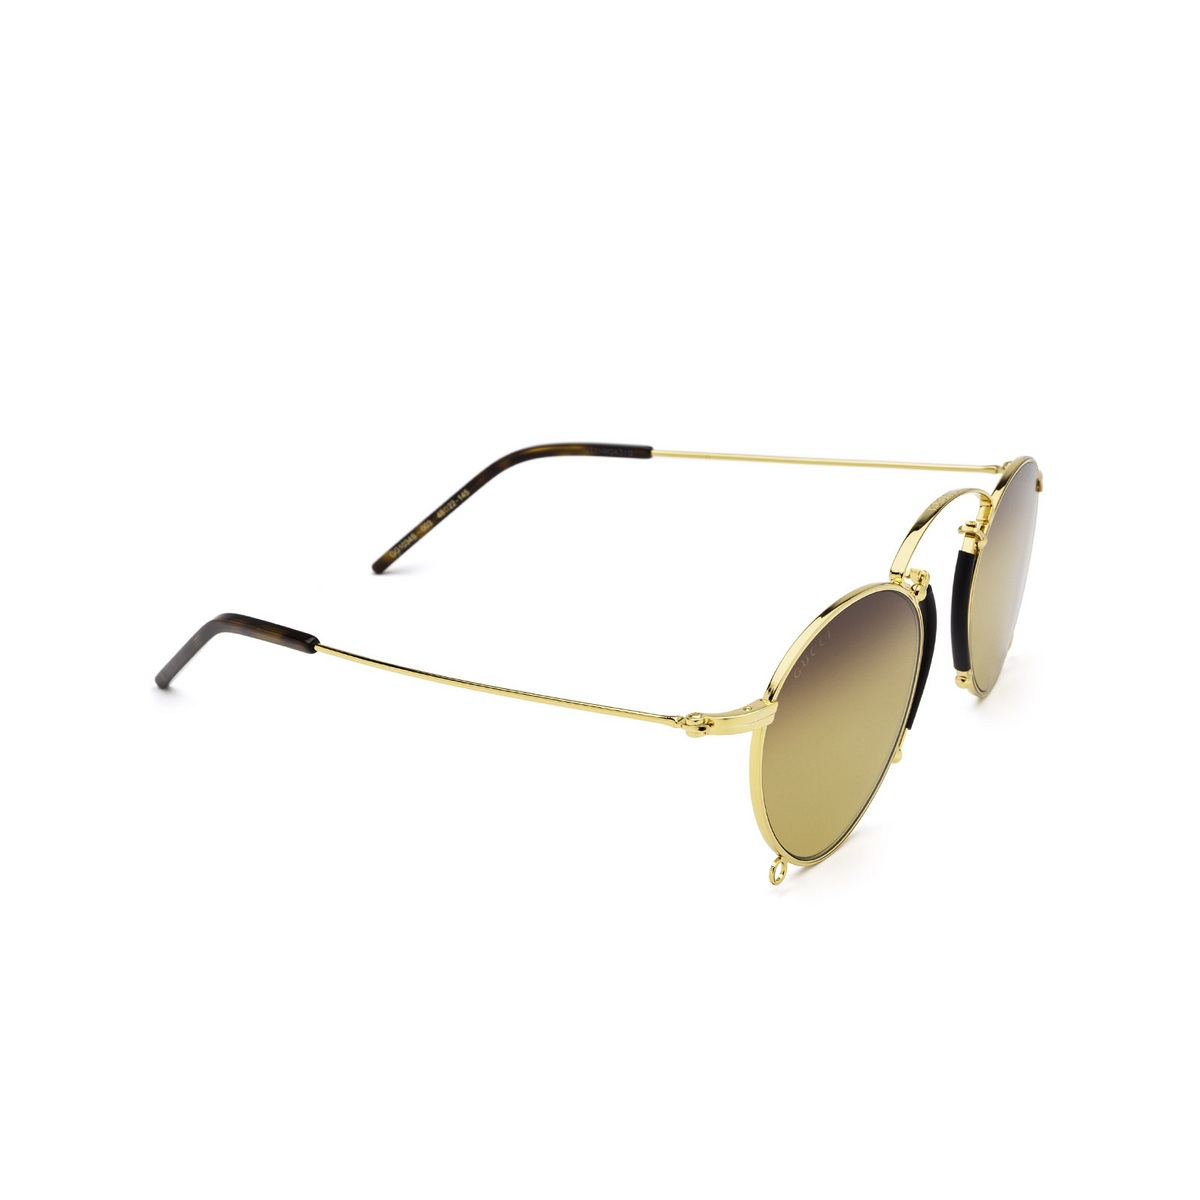 Gucci® Round Sunglasses: GG1034S color Gold 003 - three-quarters view.